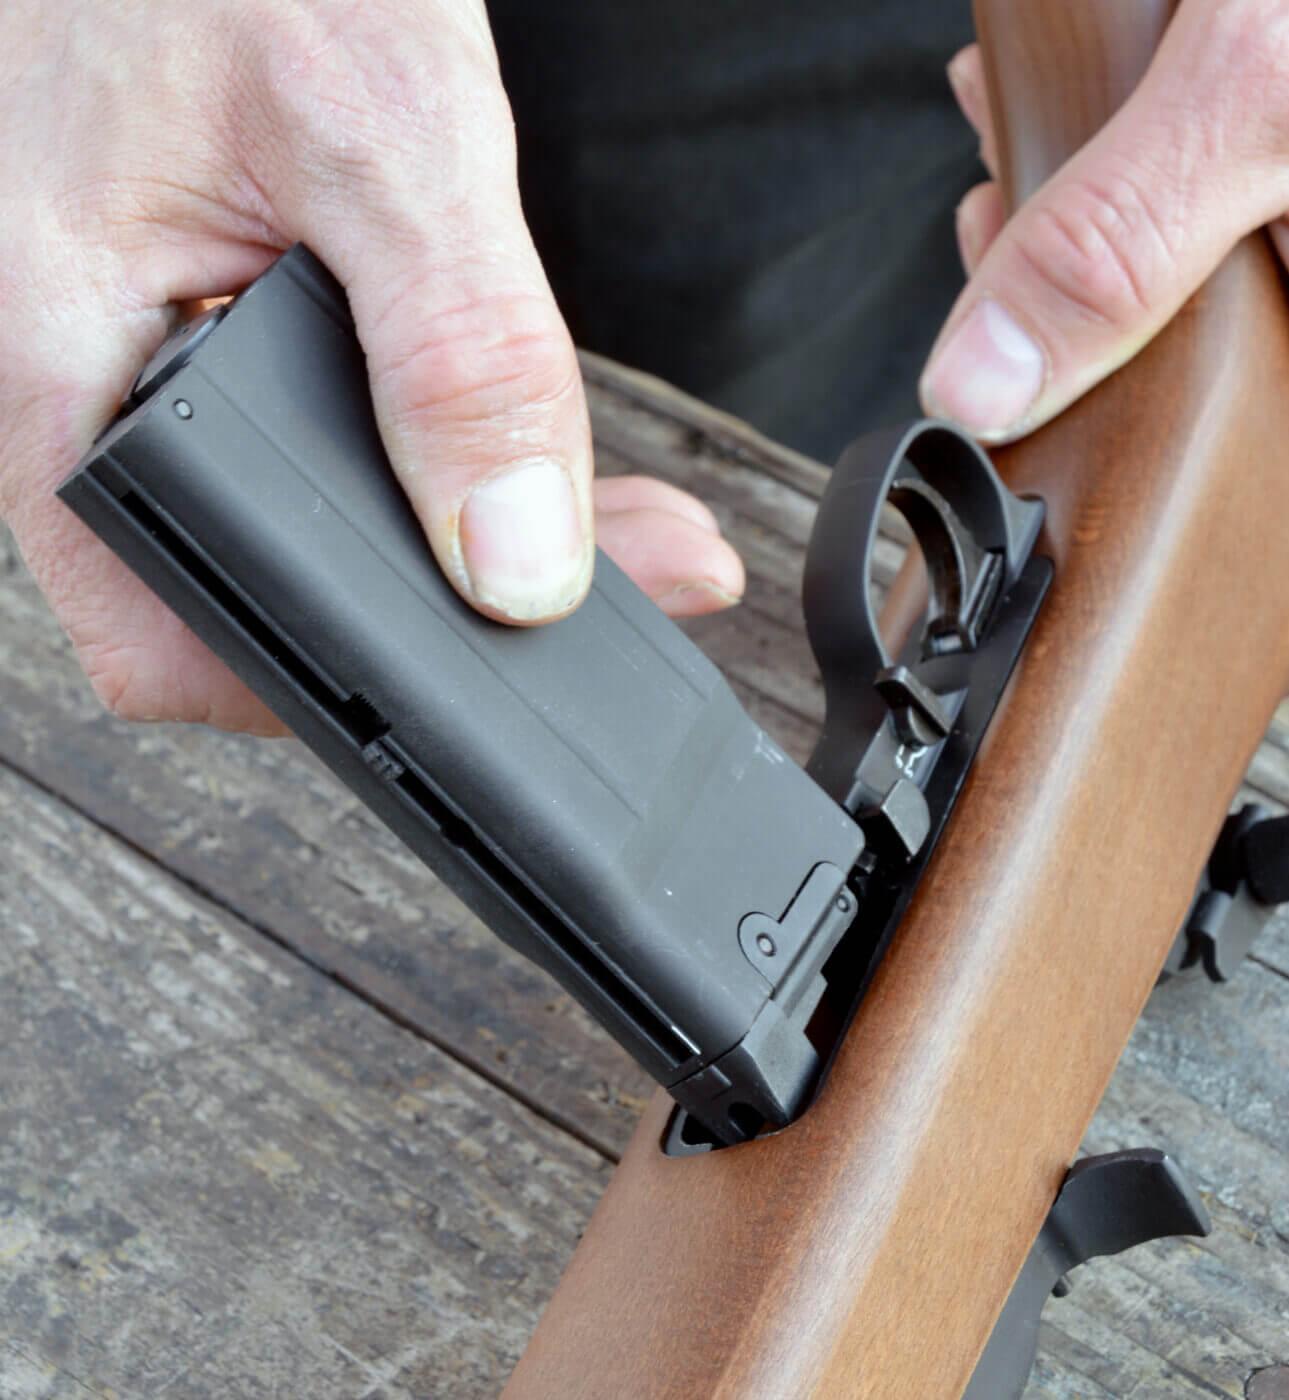 M1 Carbine BB gun magazine